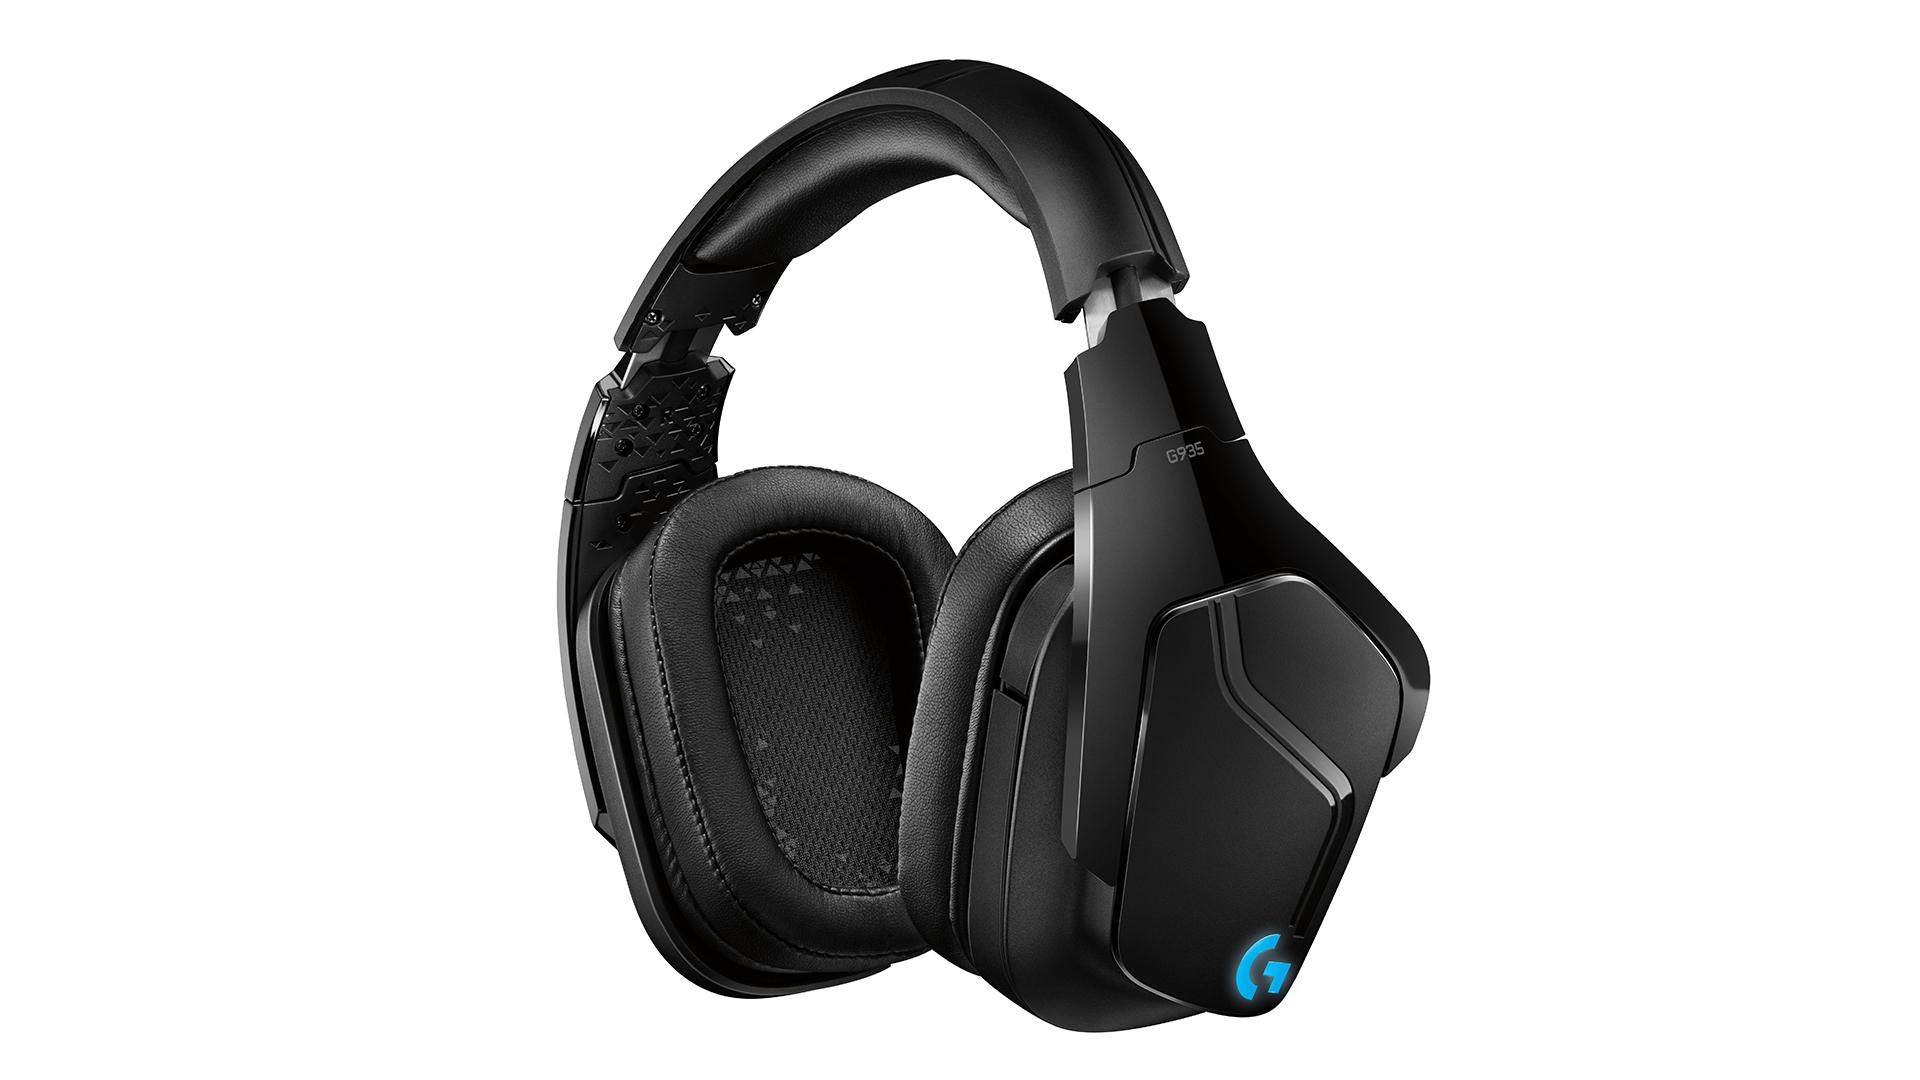 Logitech G935 7.1 Lightsync Wireless Gaming Headset